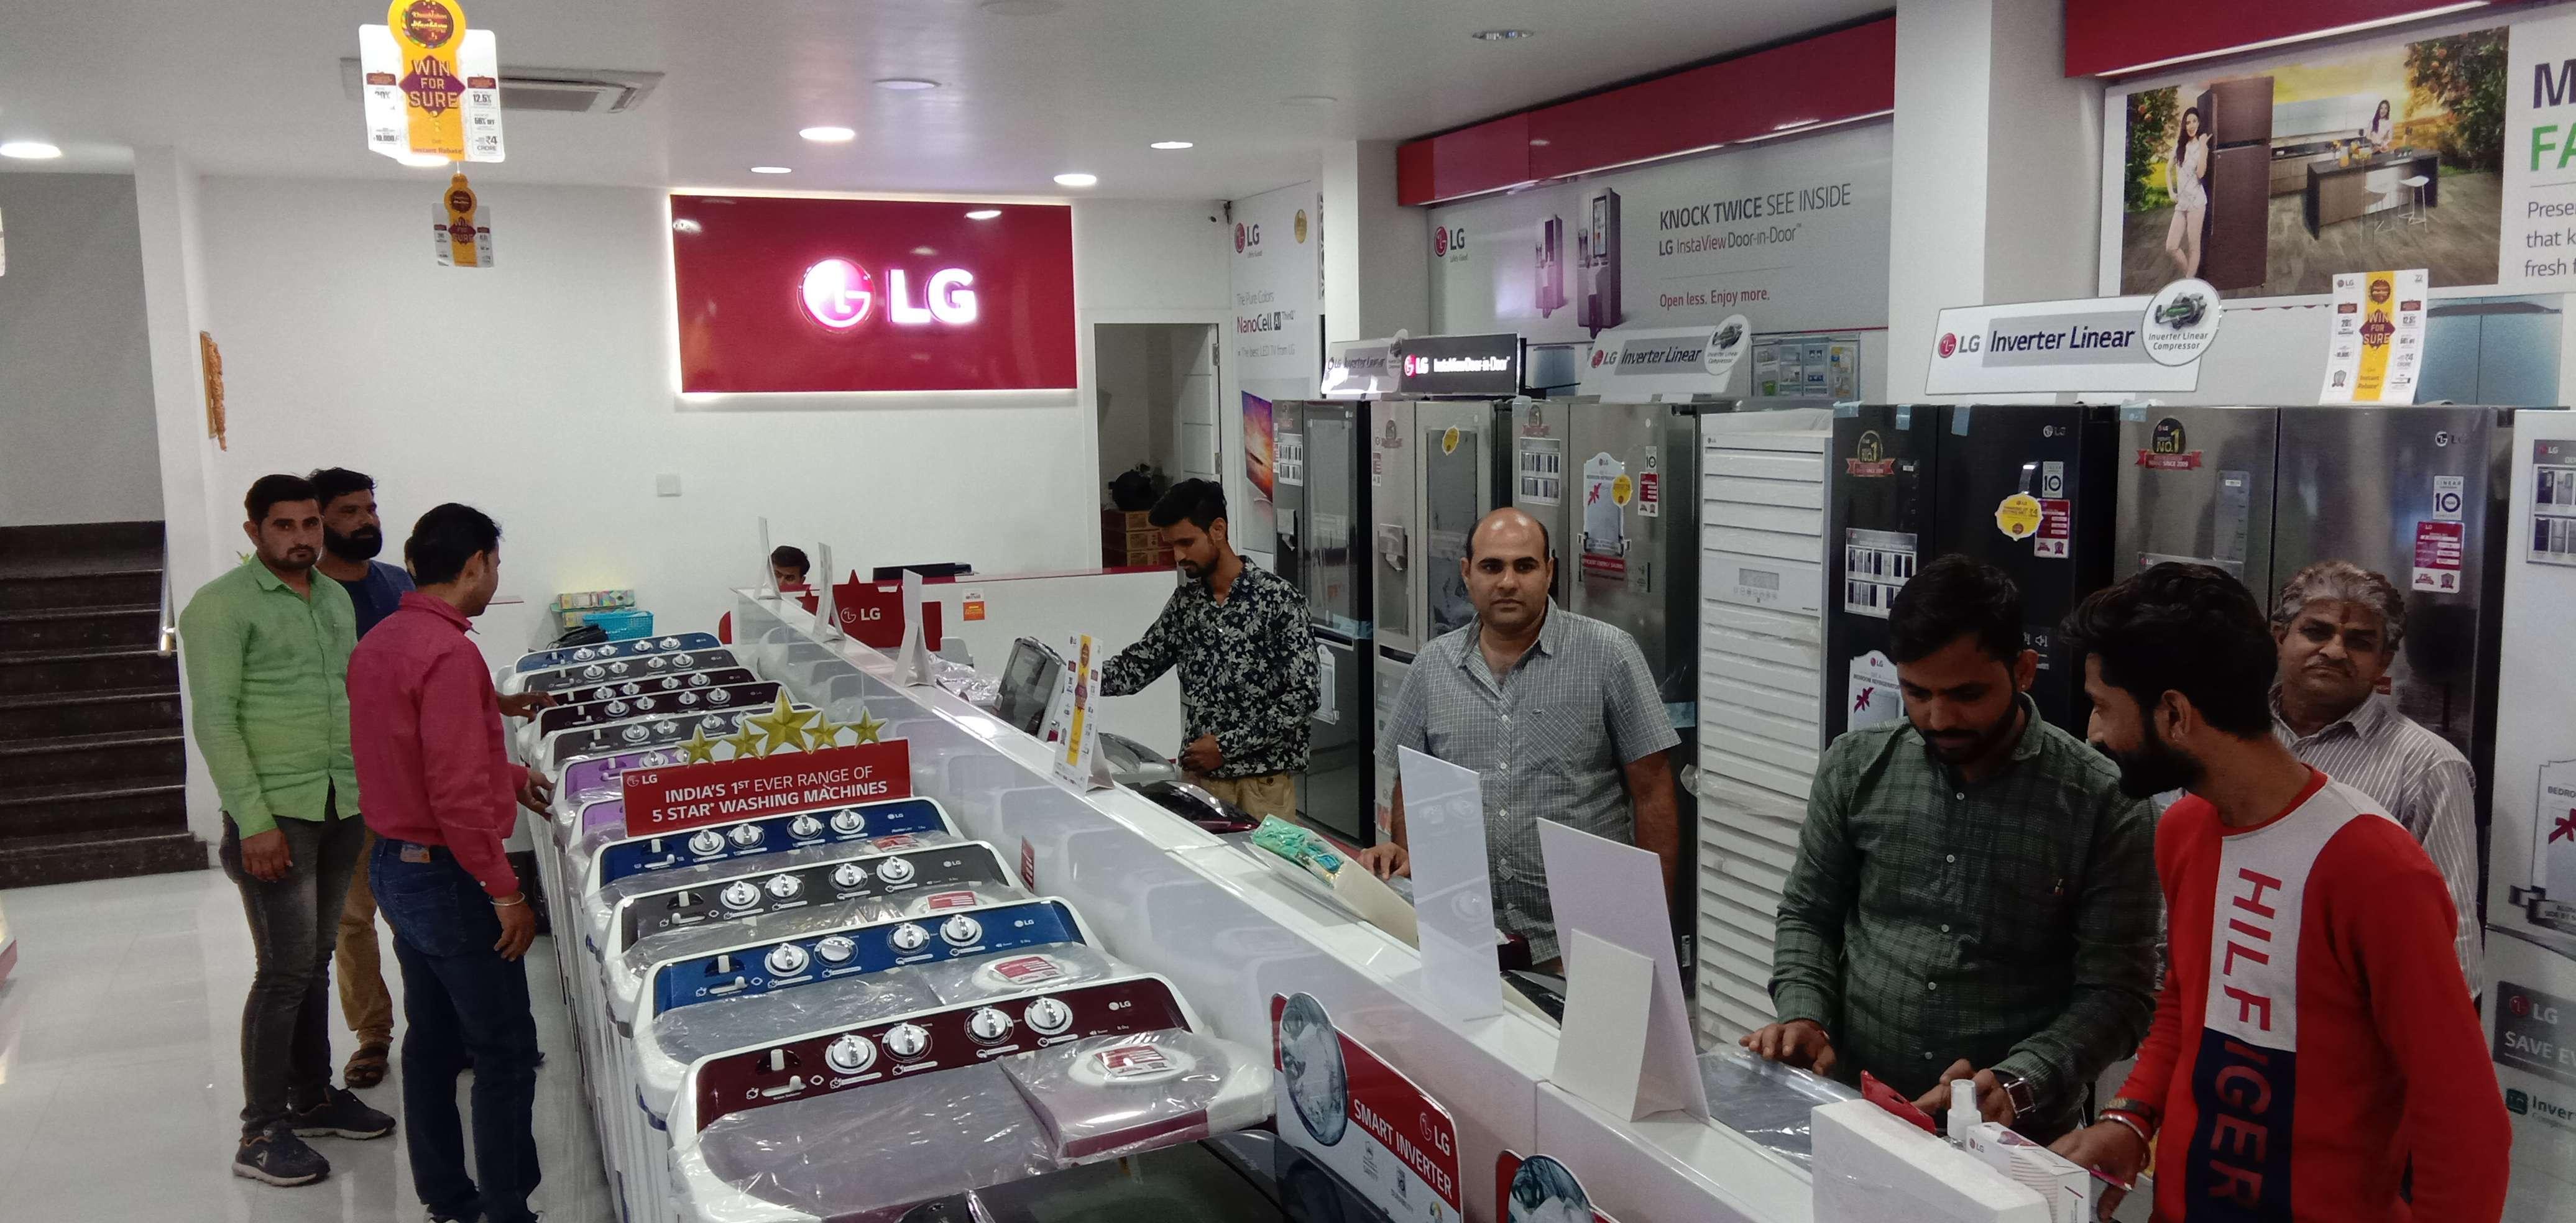 Diwali festival offers in Electronics item at bikaner